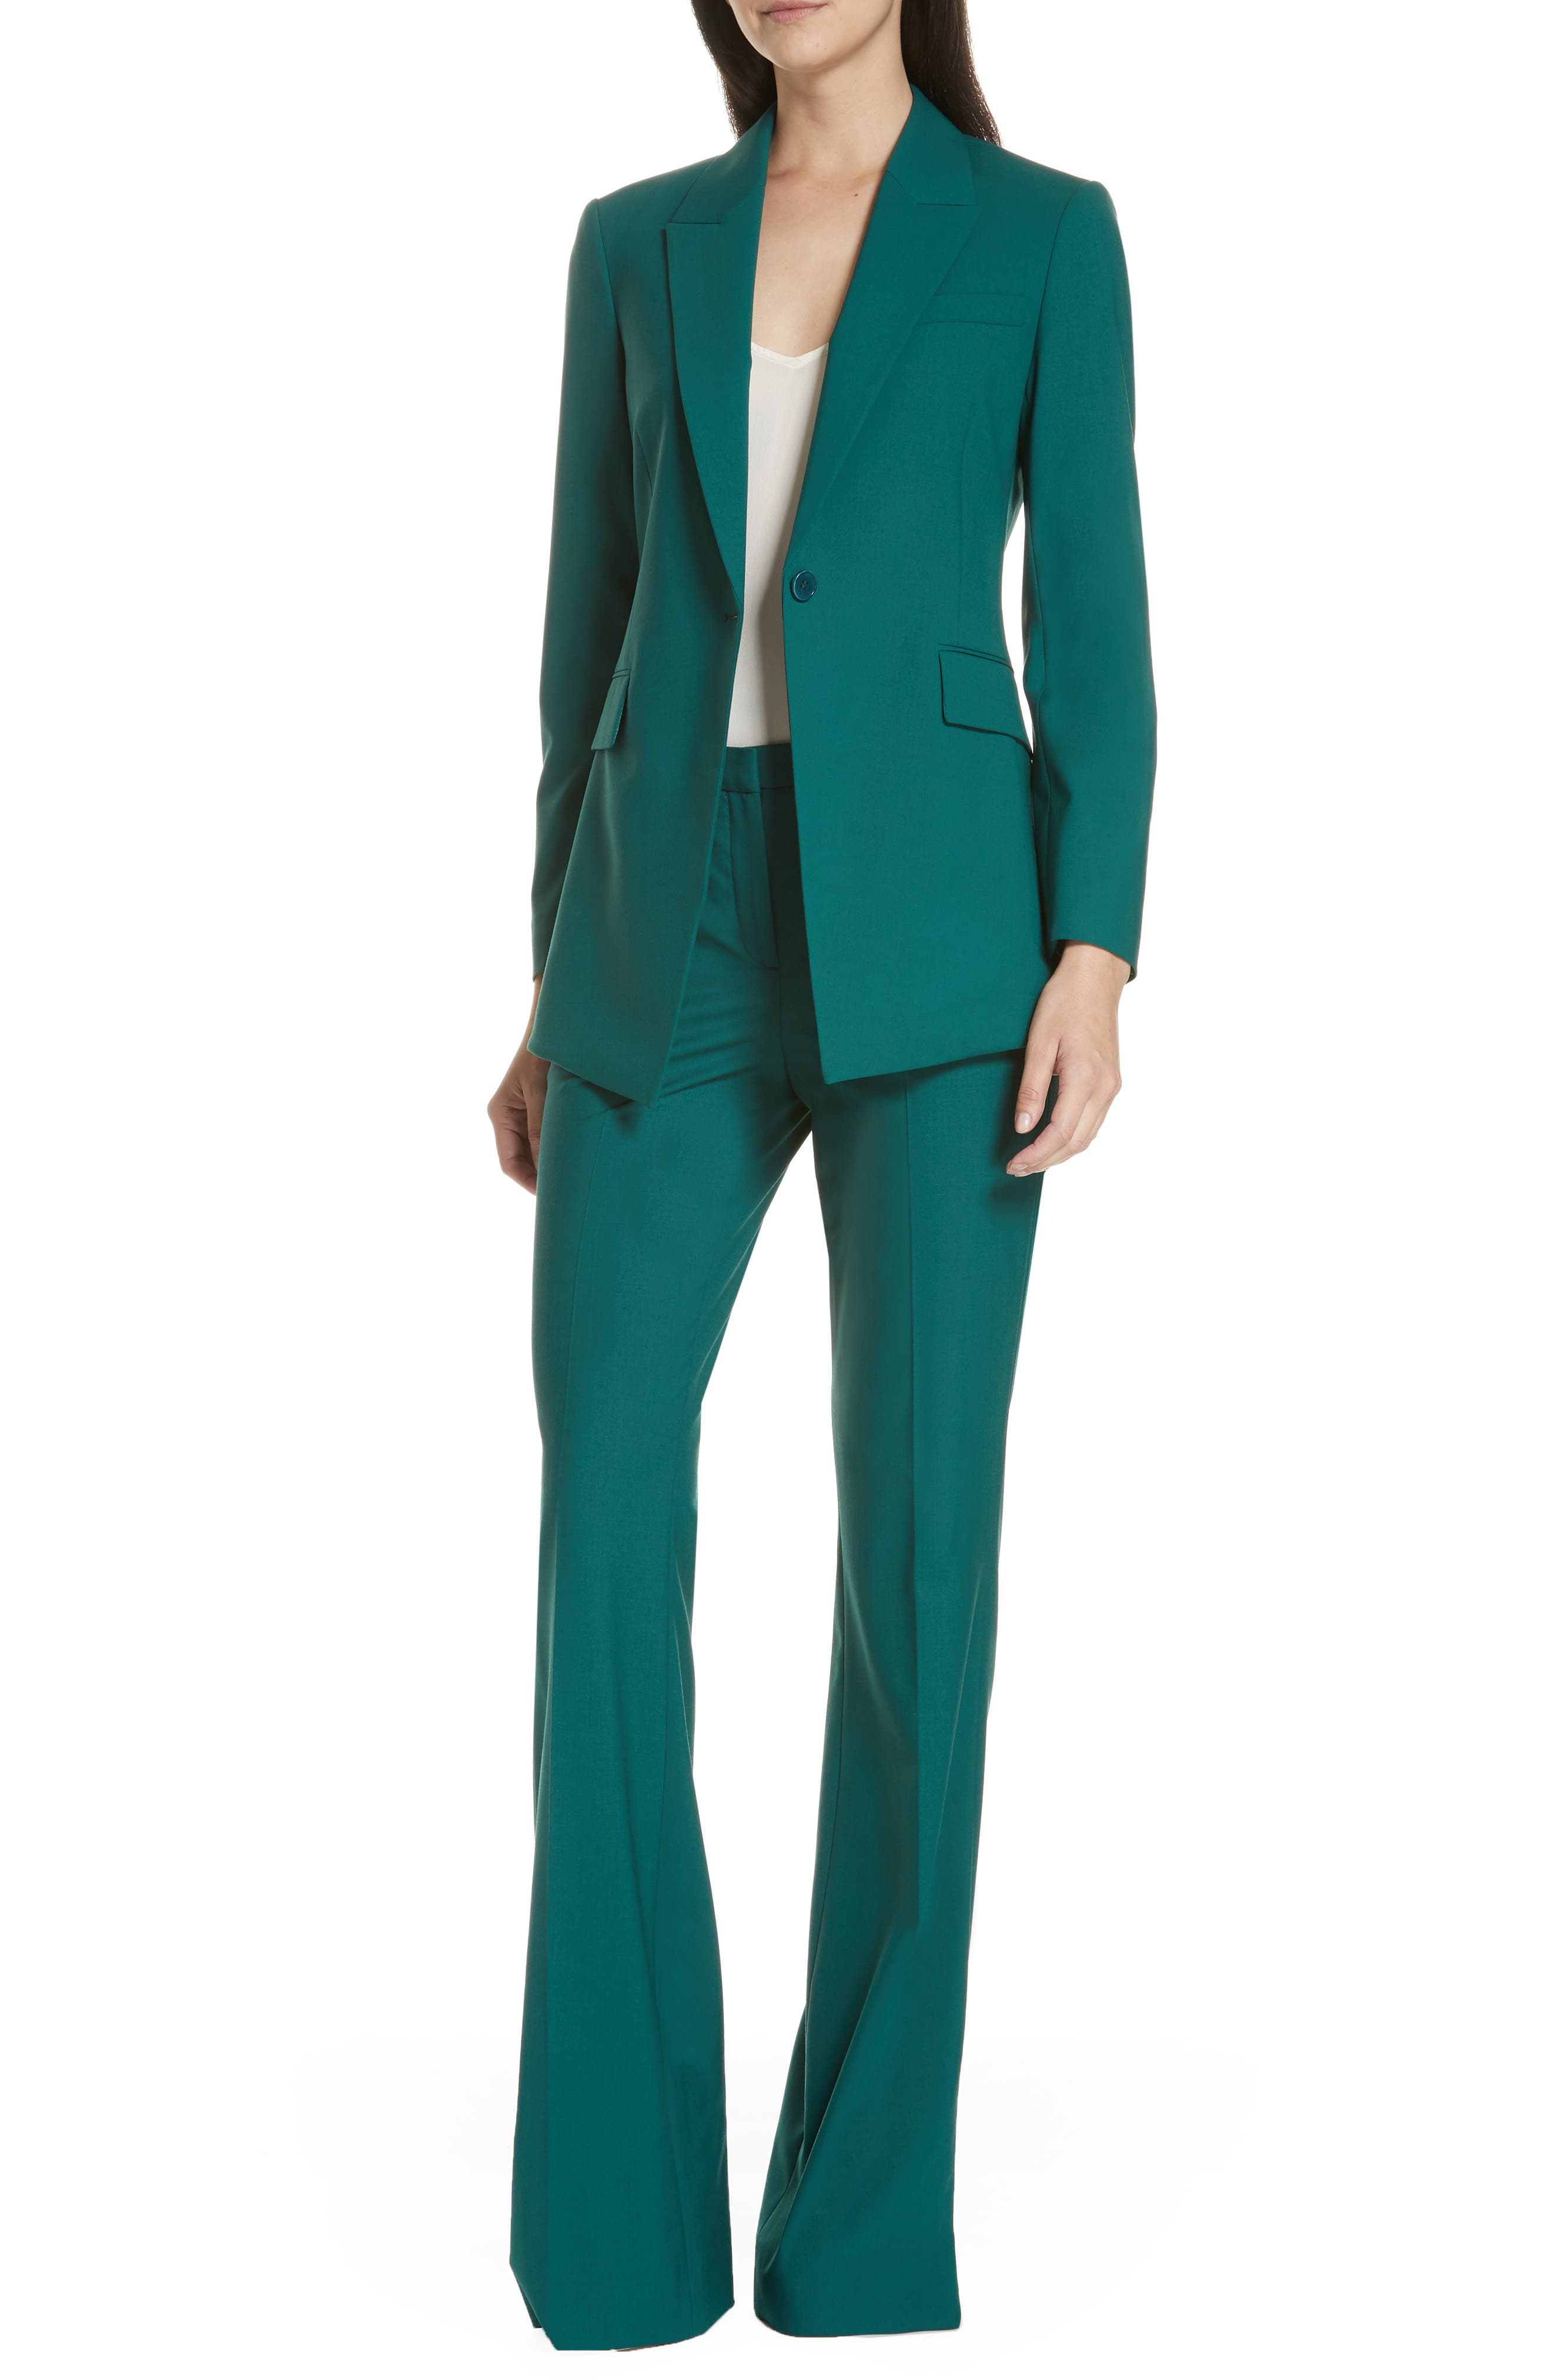 Etienette B Good Wool Suit Jacket,                             Alternate thumbnail 48, color,